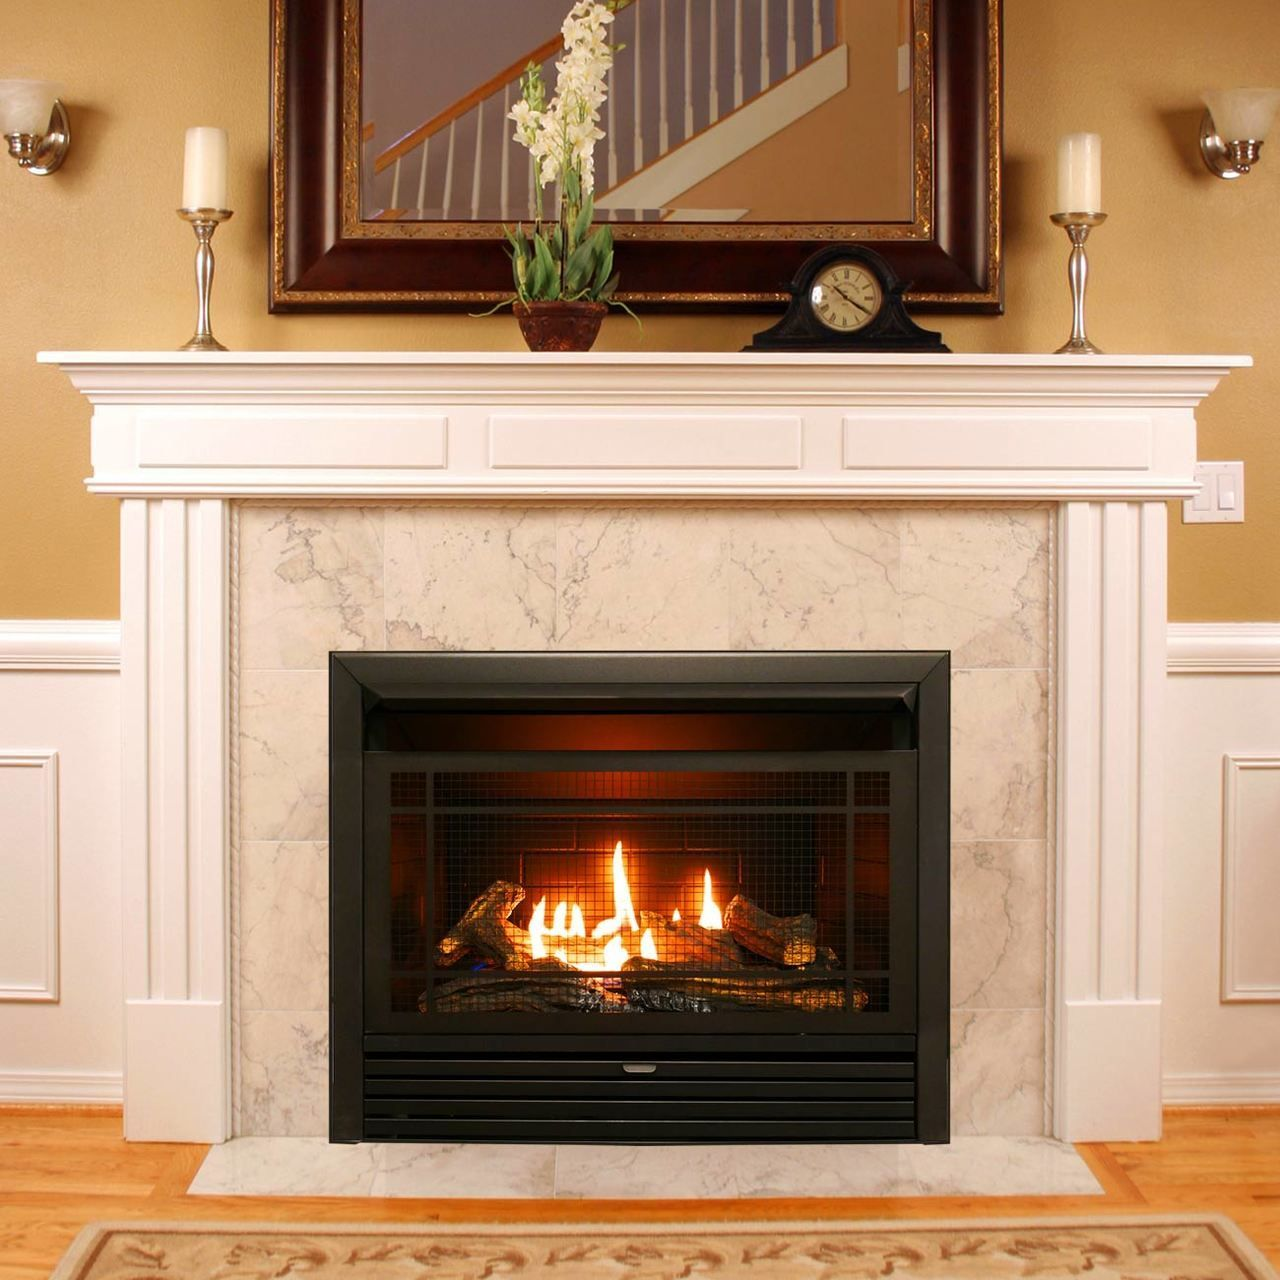 Duluth dual fuel ventless fireplace insert 26000